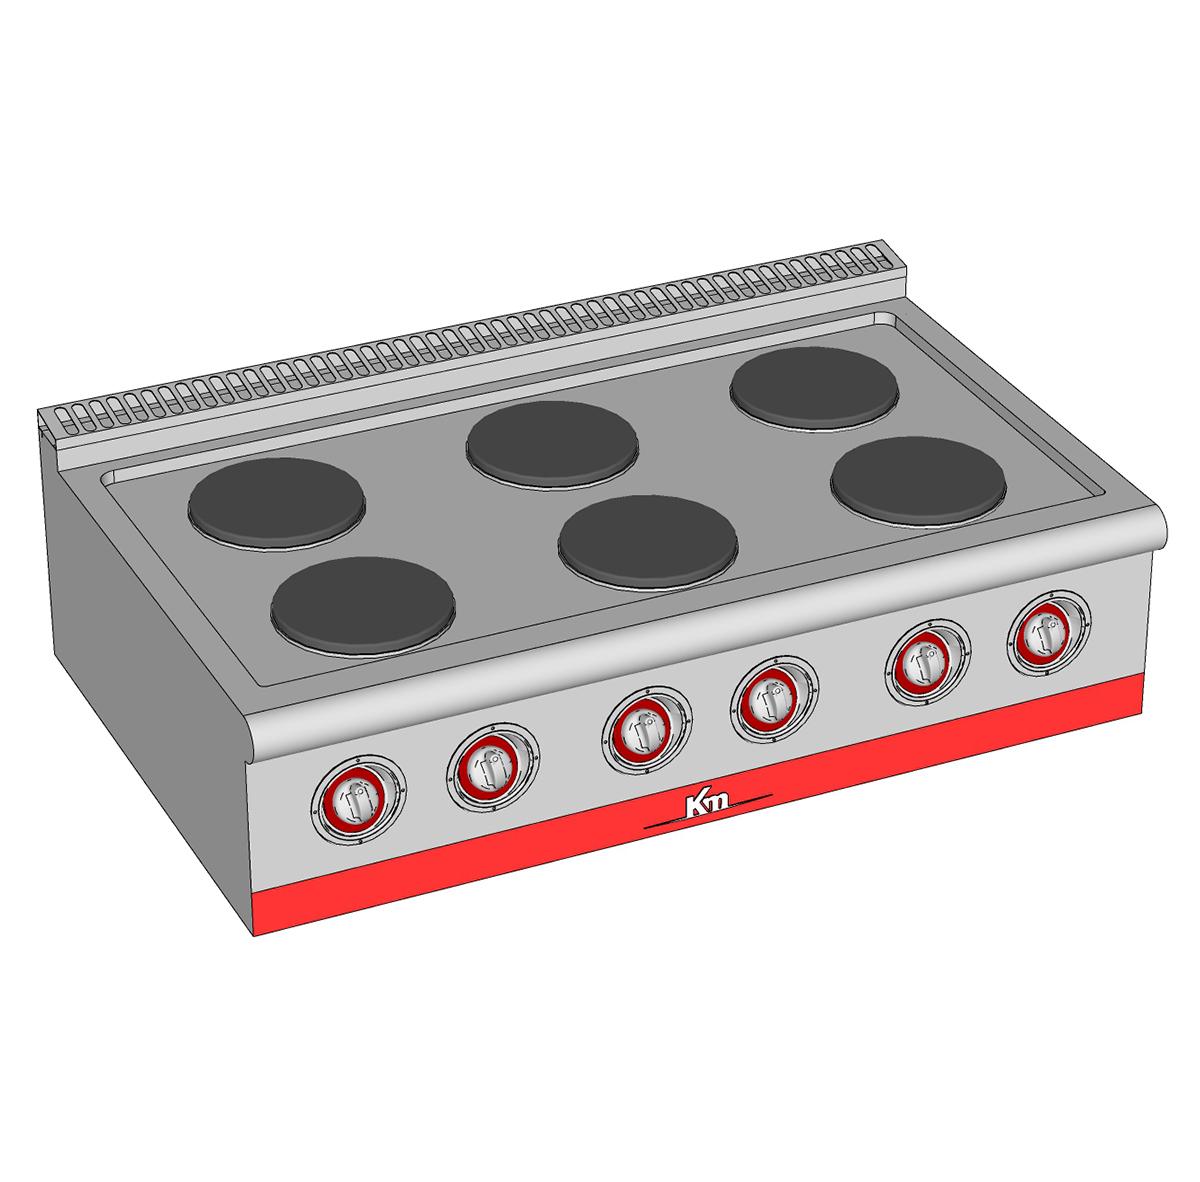 Industrial Electric Cooker